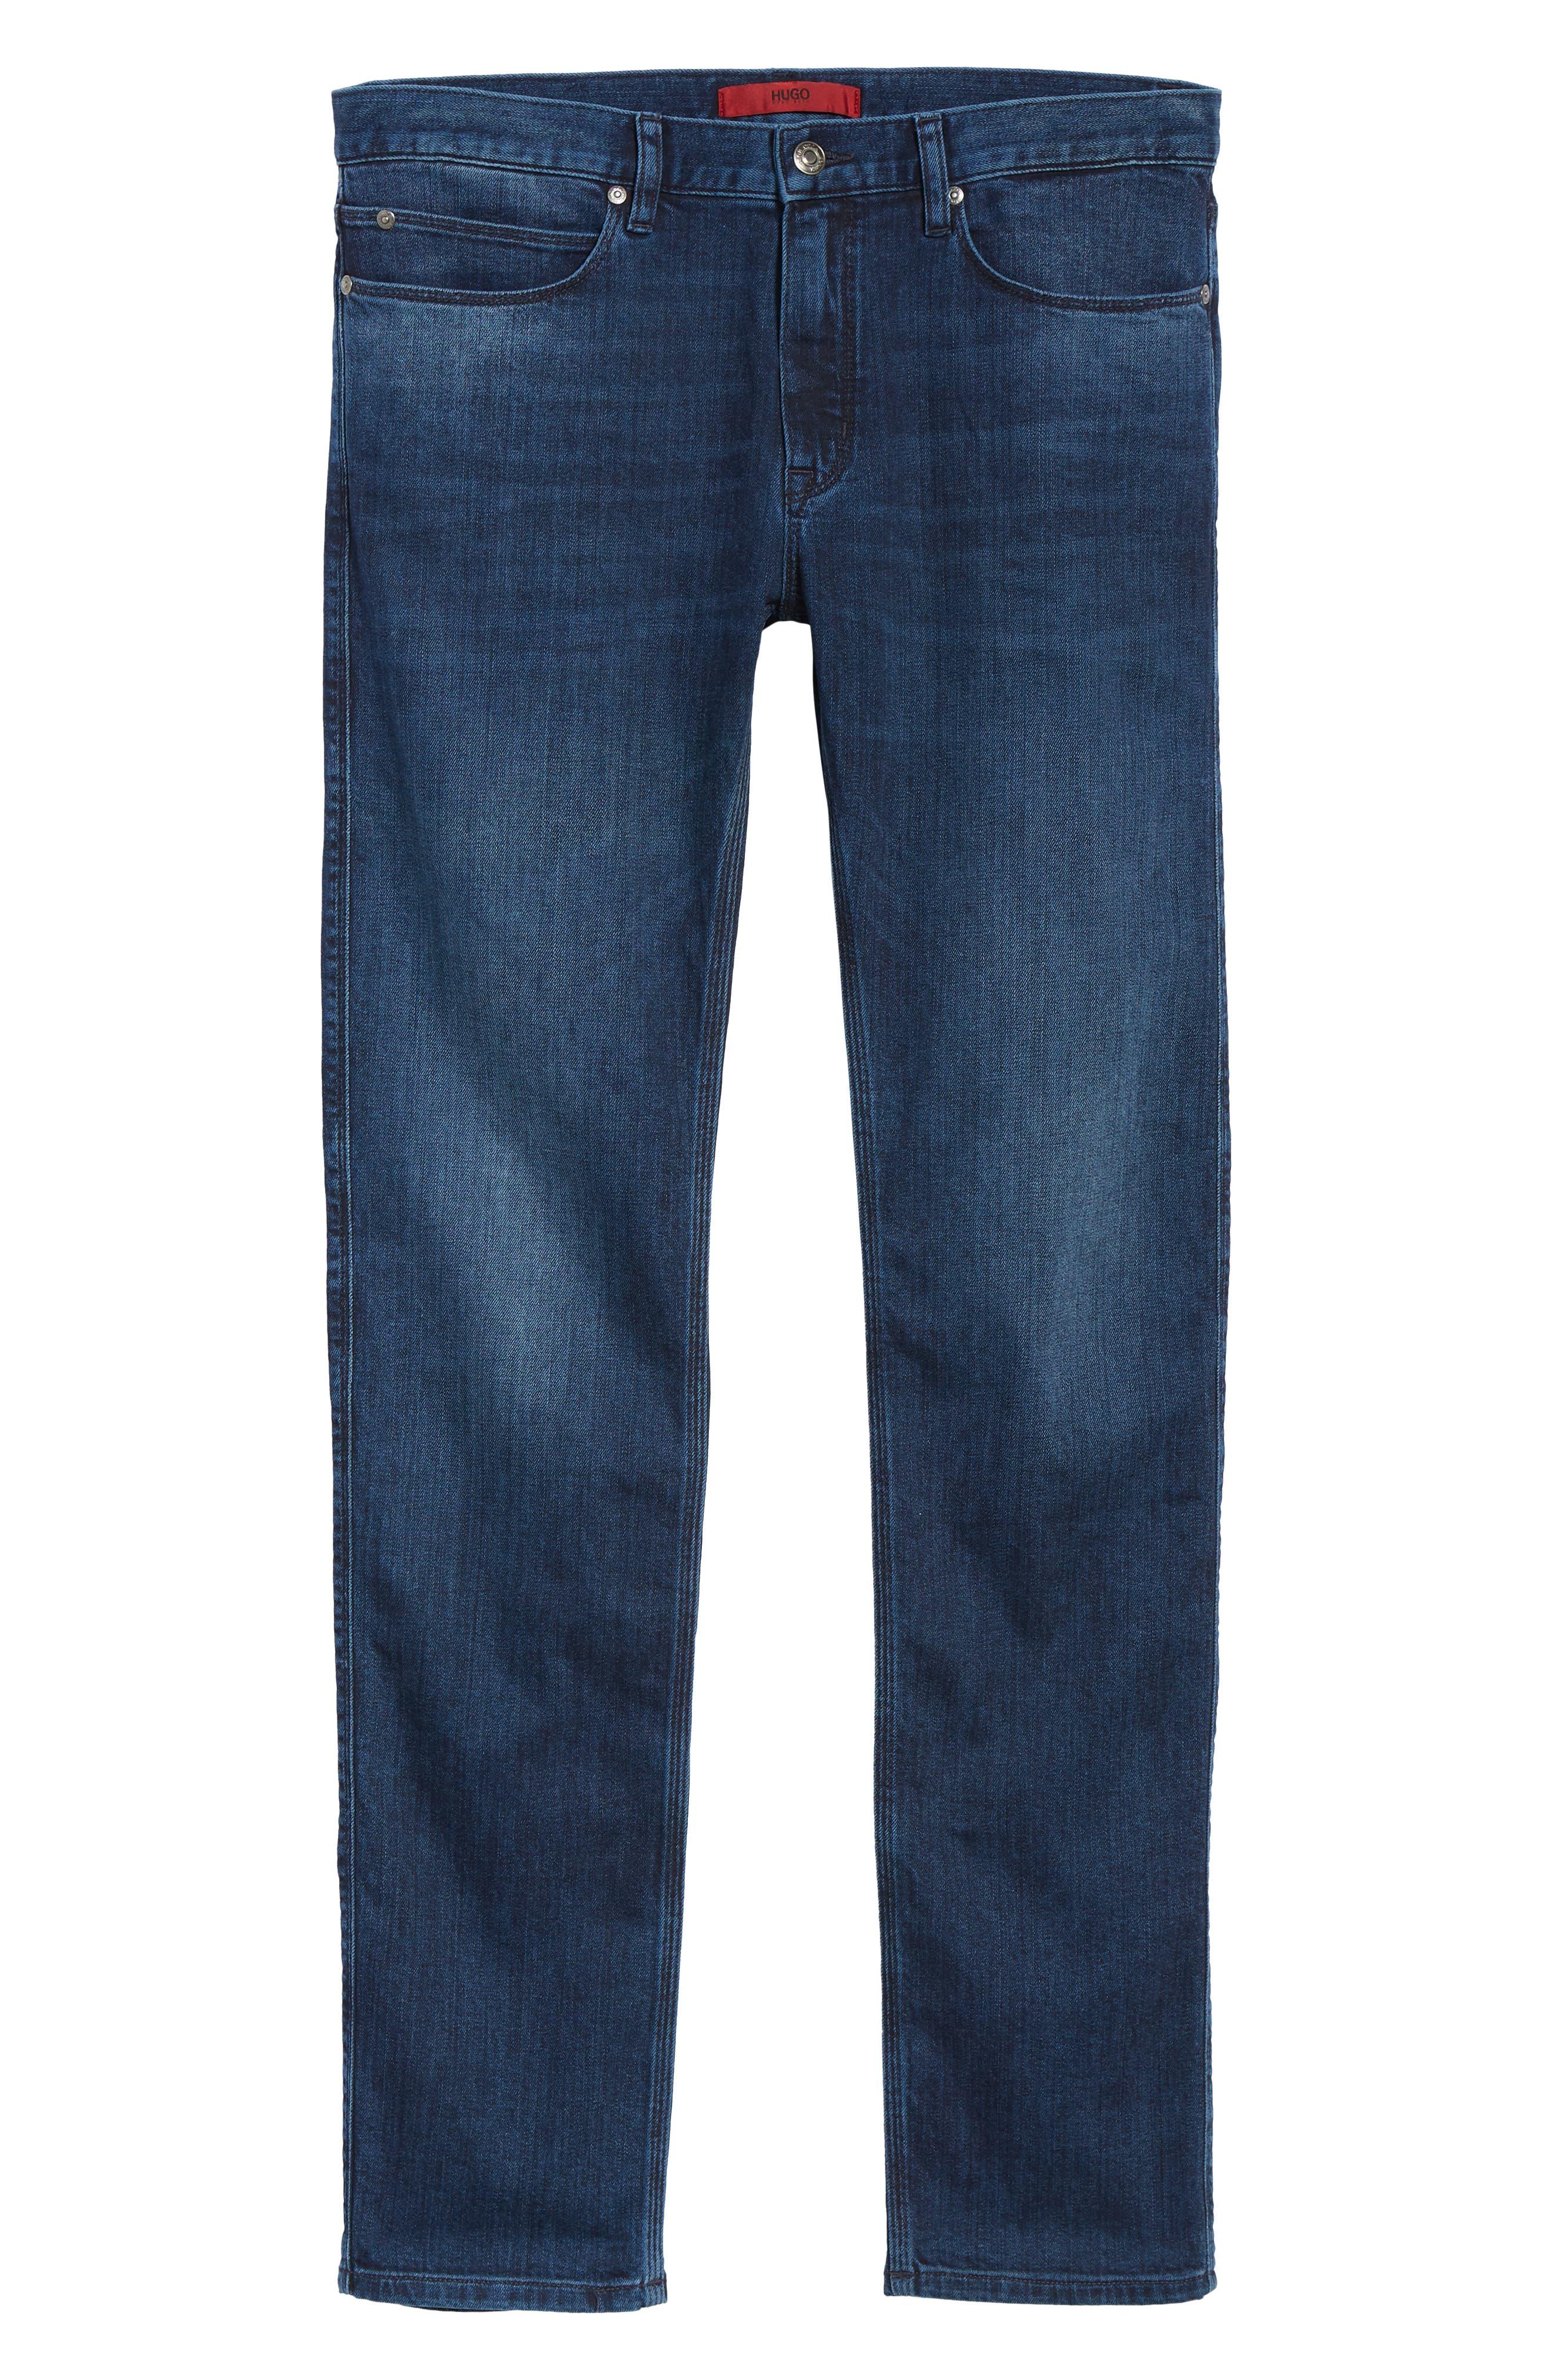 708 Stretch Slim Fit Jeans,                             Alternate thumbnail 6, color,                             BLUE